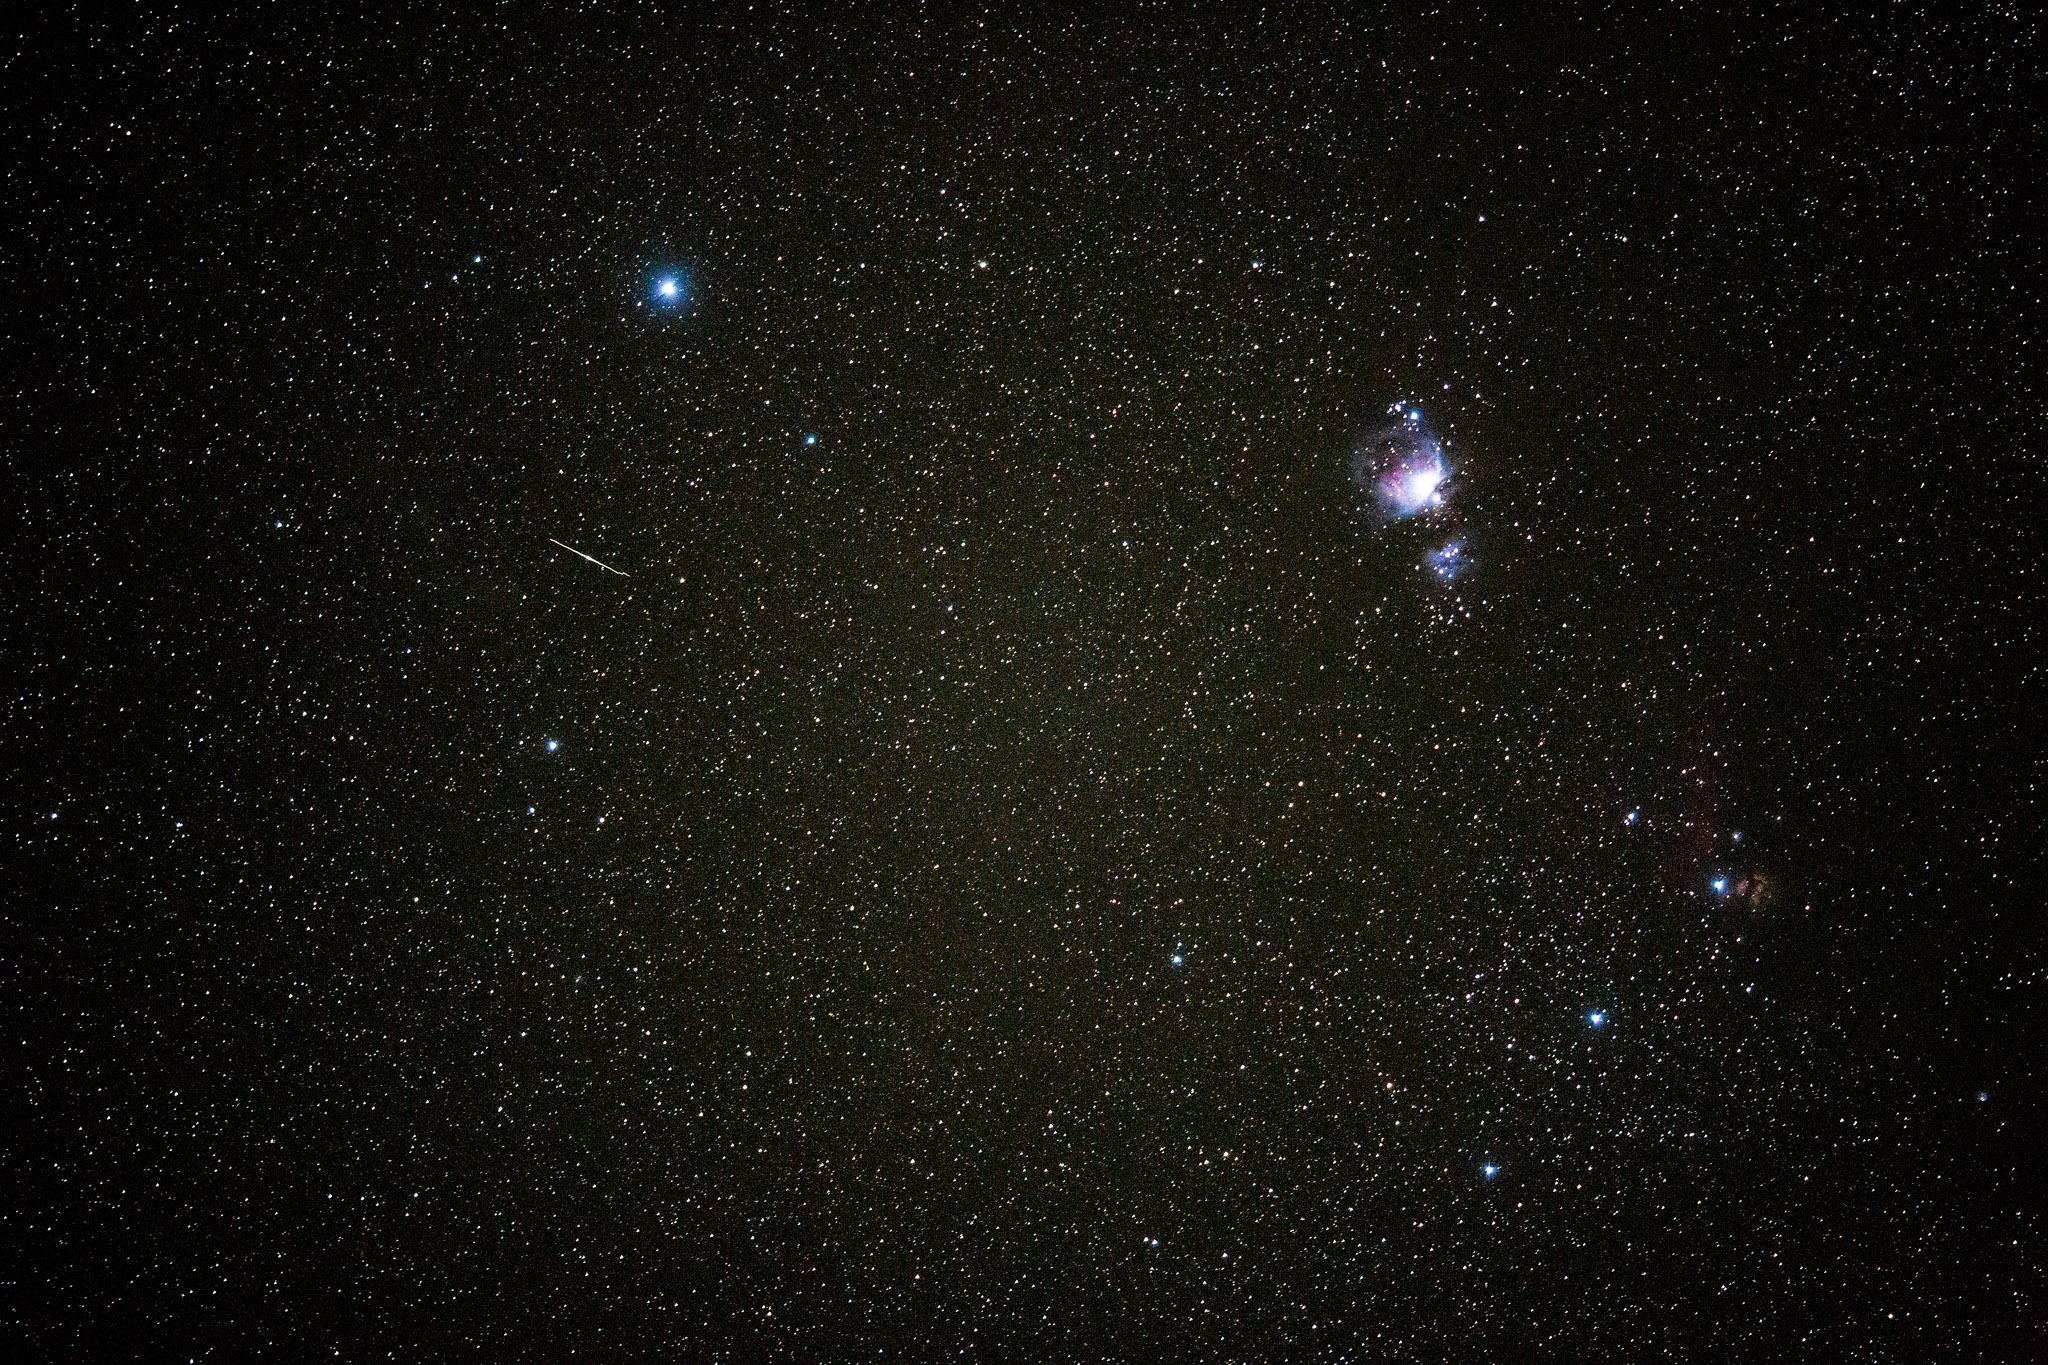 wedding-travellers-argentina-nigh-sky-stars